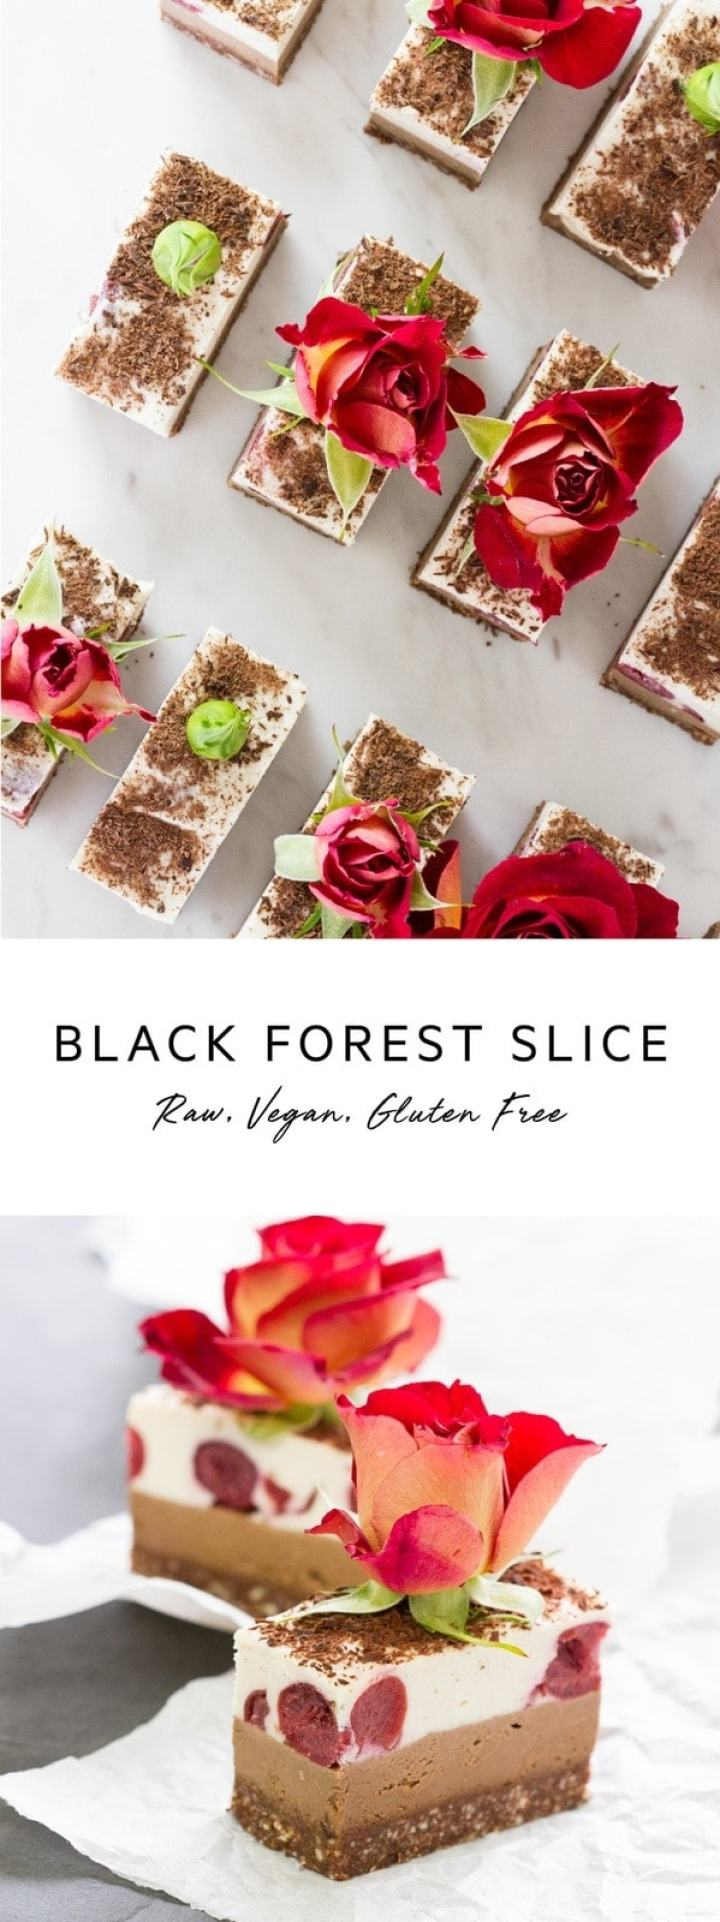 Raw Black Forest Slice. A light raw vegan dessert. #vegandessert #rawslice #rawdessert #blackforest #AscensionKitchen